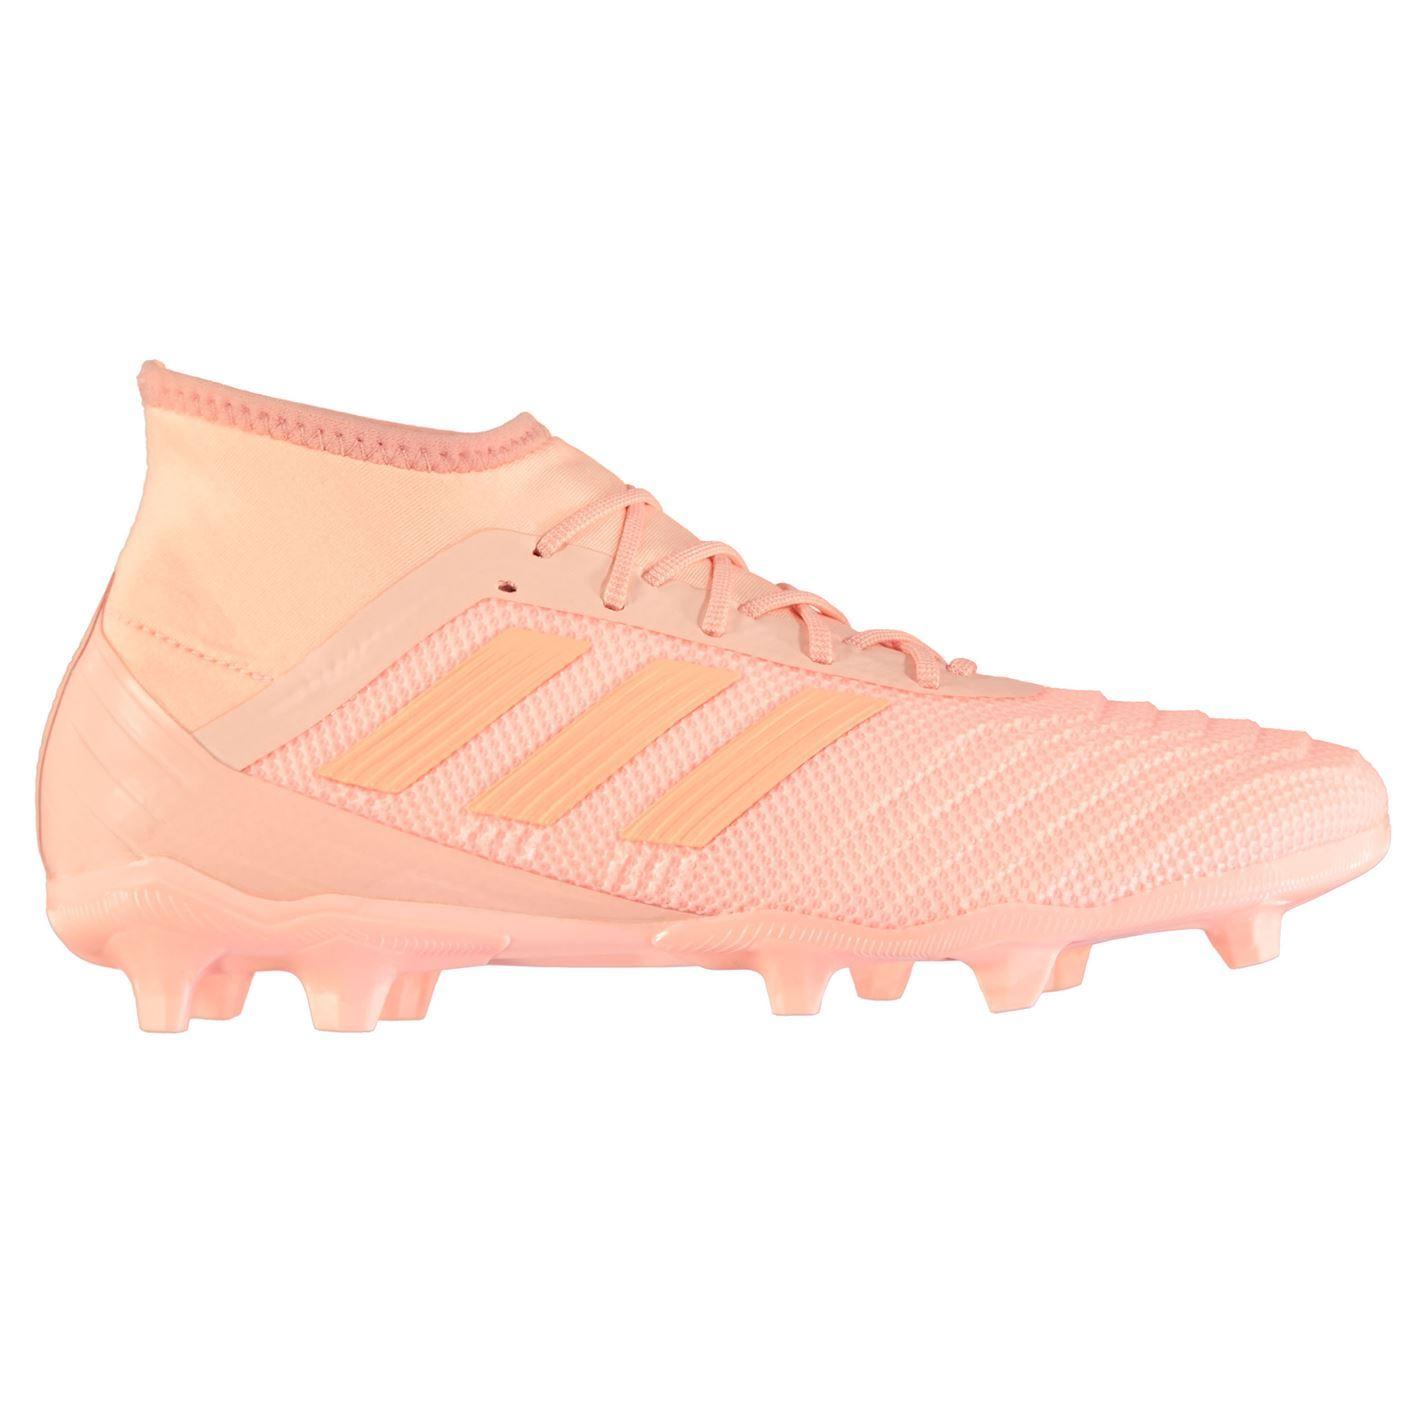 Adidas-Predator-18-2-FG-Firm-Ground-Chaussures-De-Football-Homme-Football-Chaussures-Crampons miniature 6